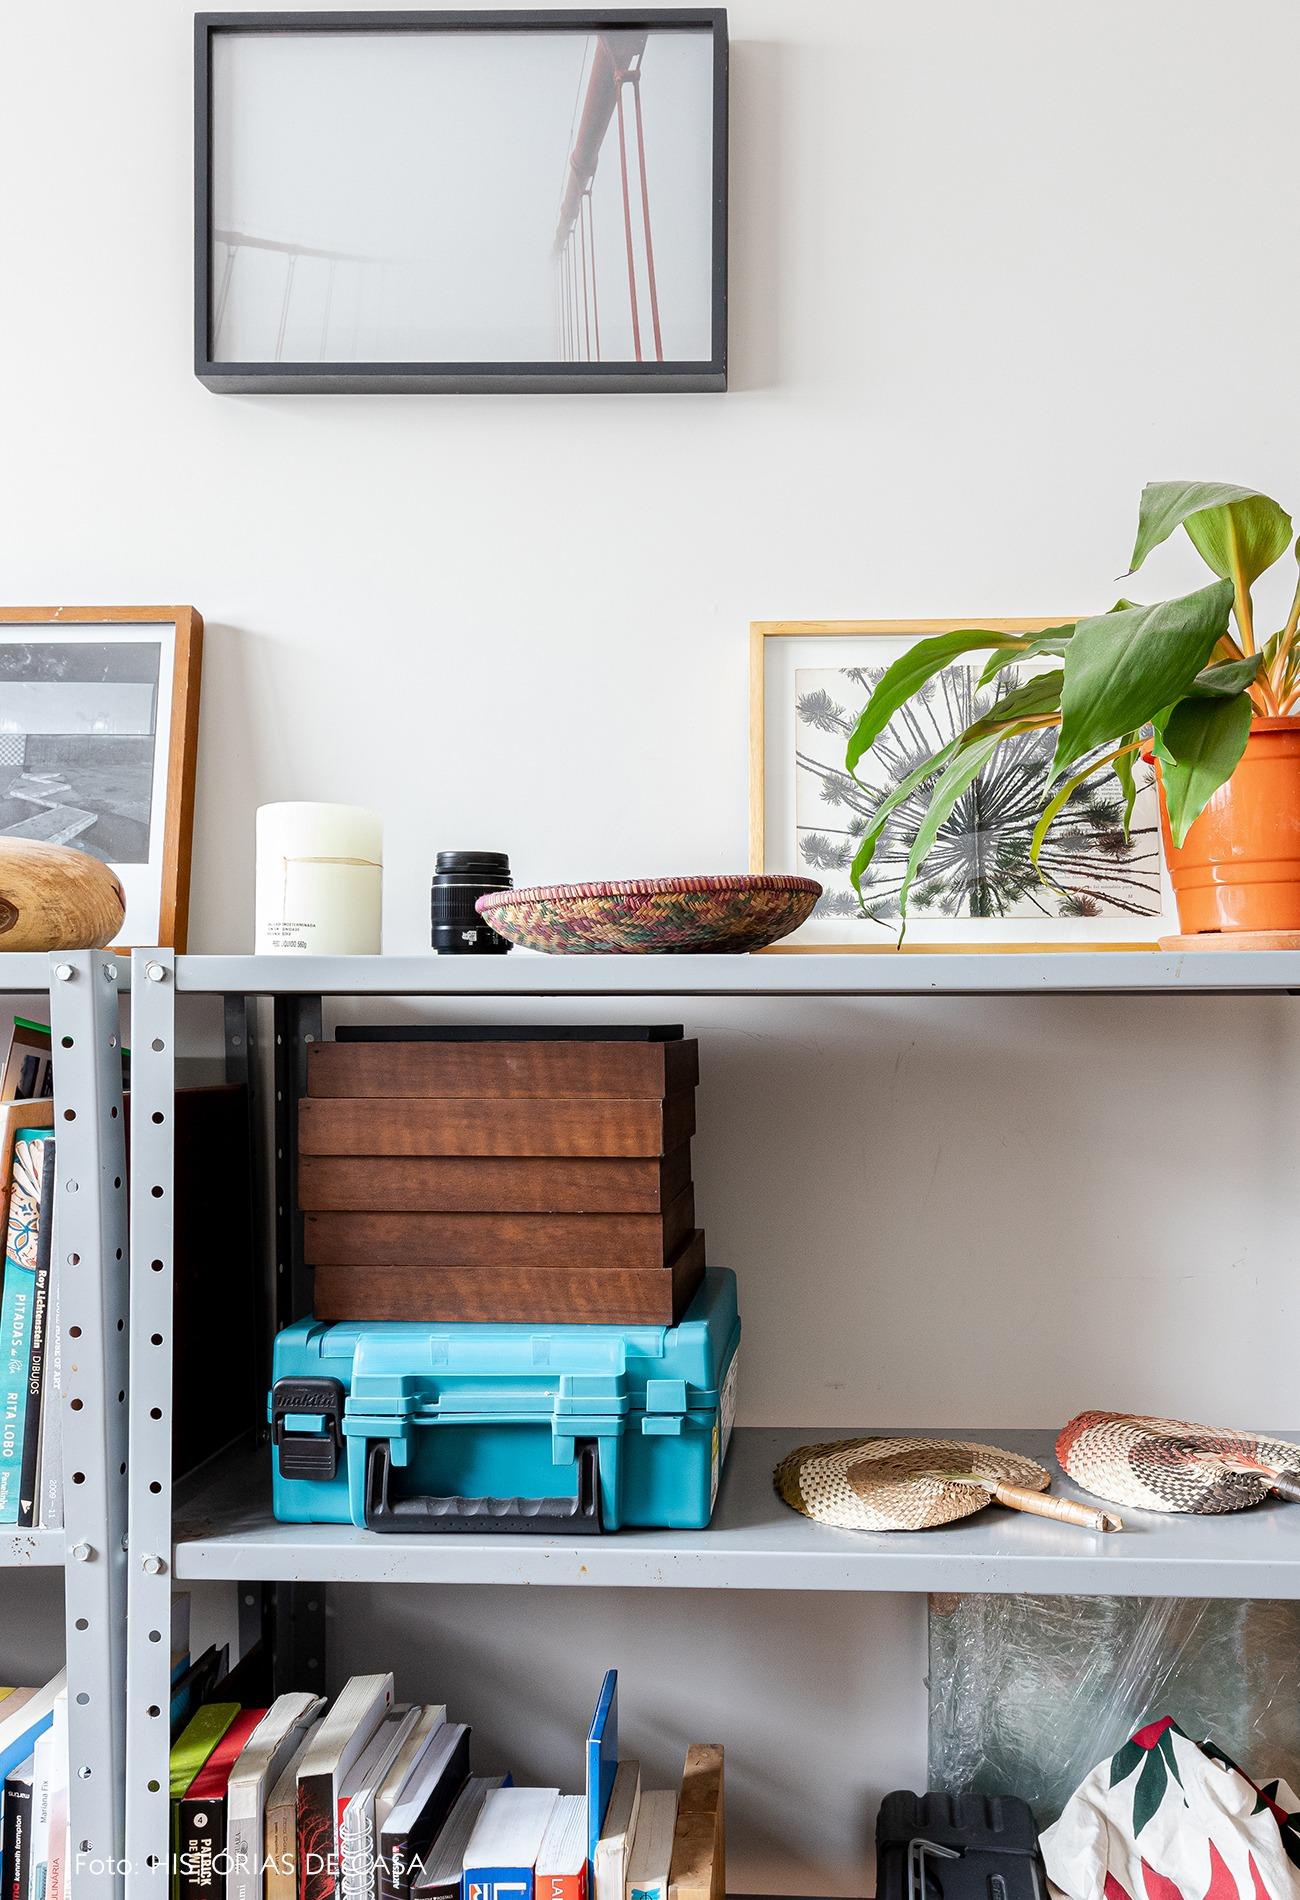 home-office-prateleira-cinza-planta-vaso-laranja